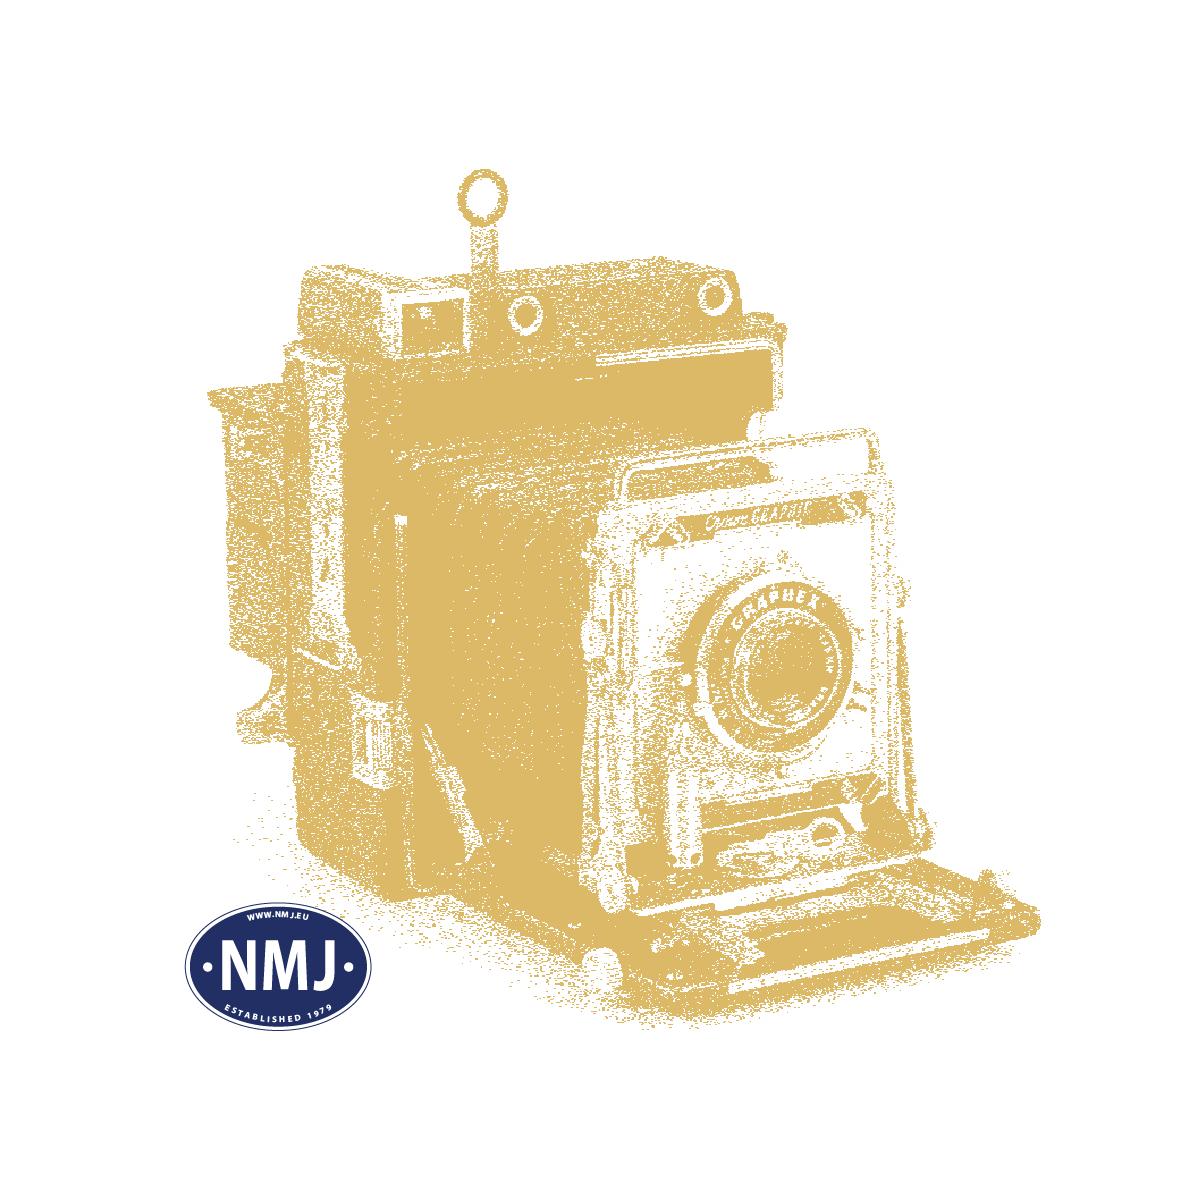 NMJT106.503 - NMJ Topline NSB B3-6 25624